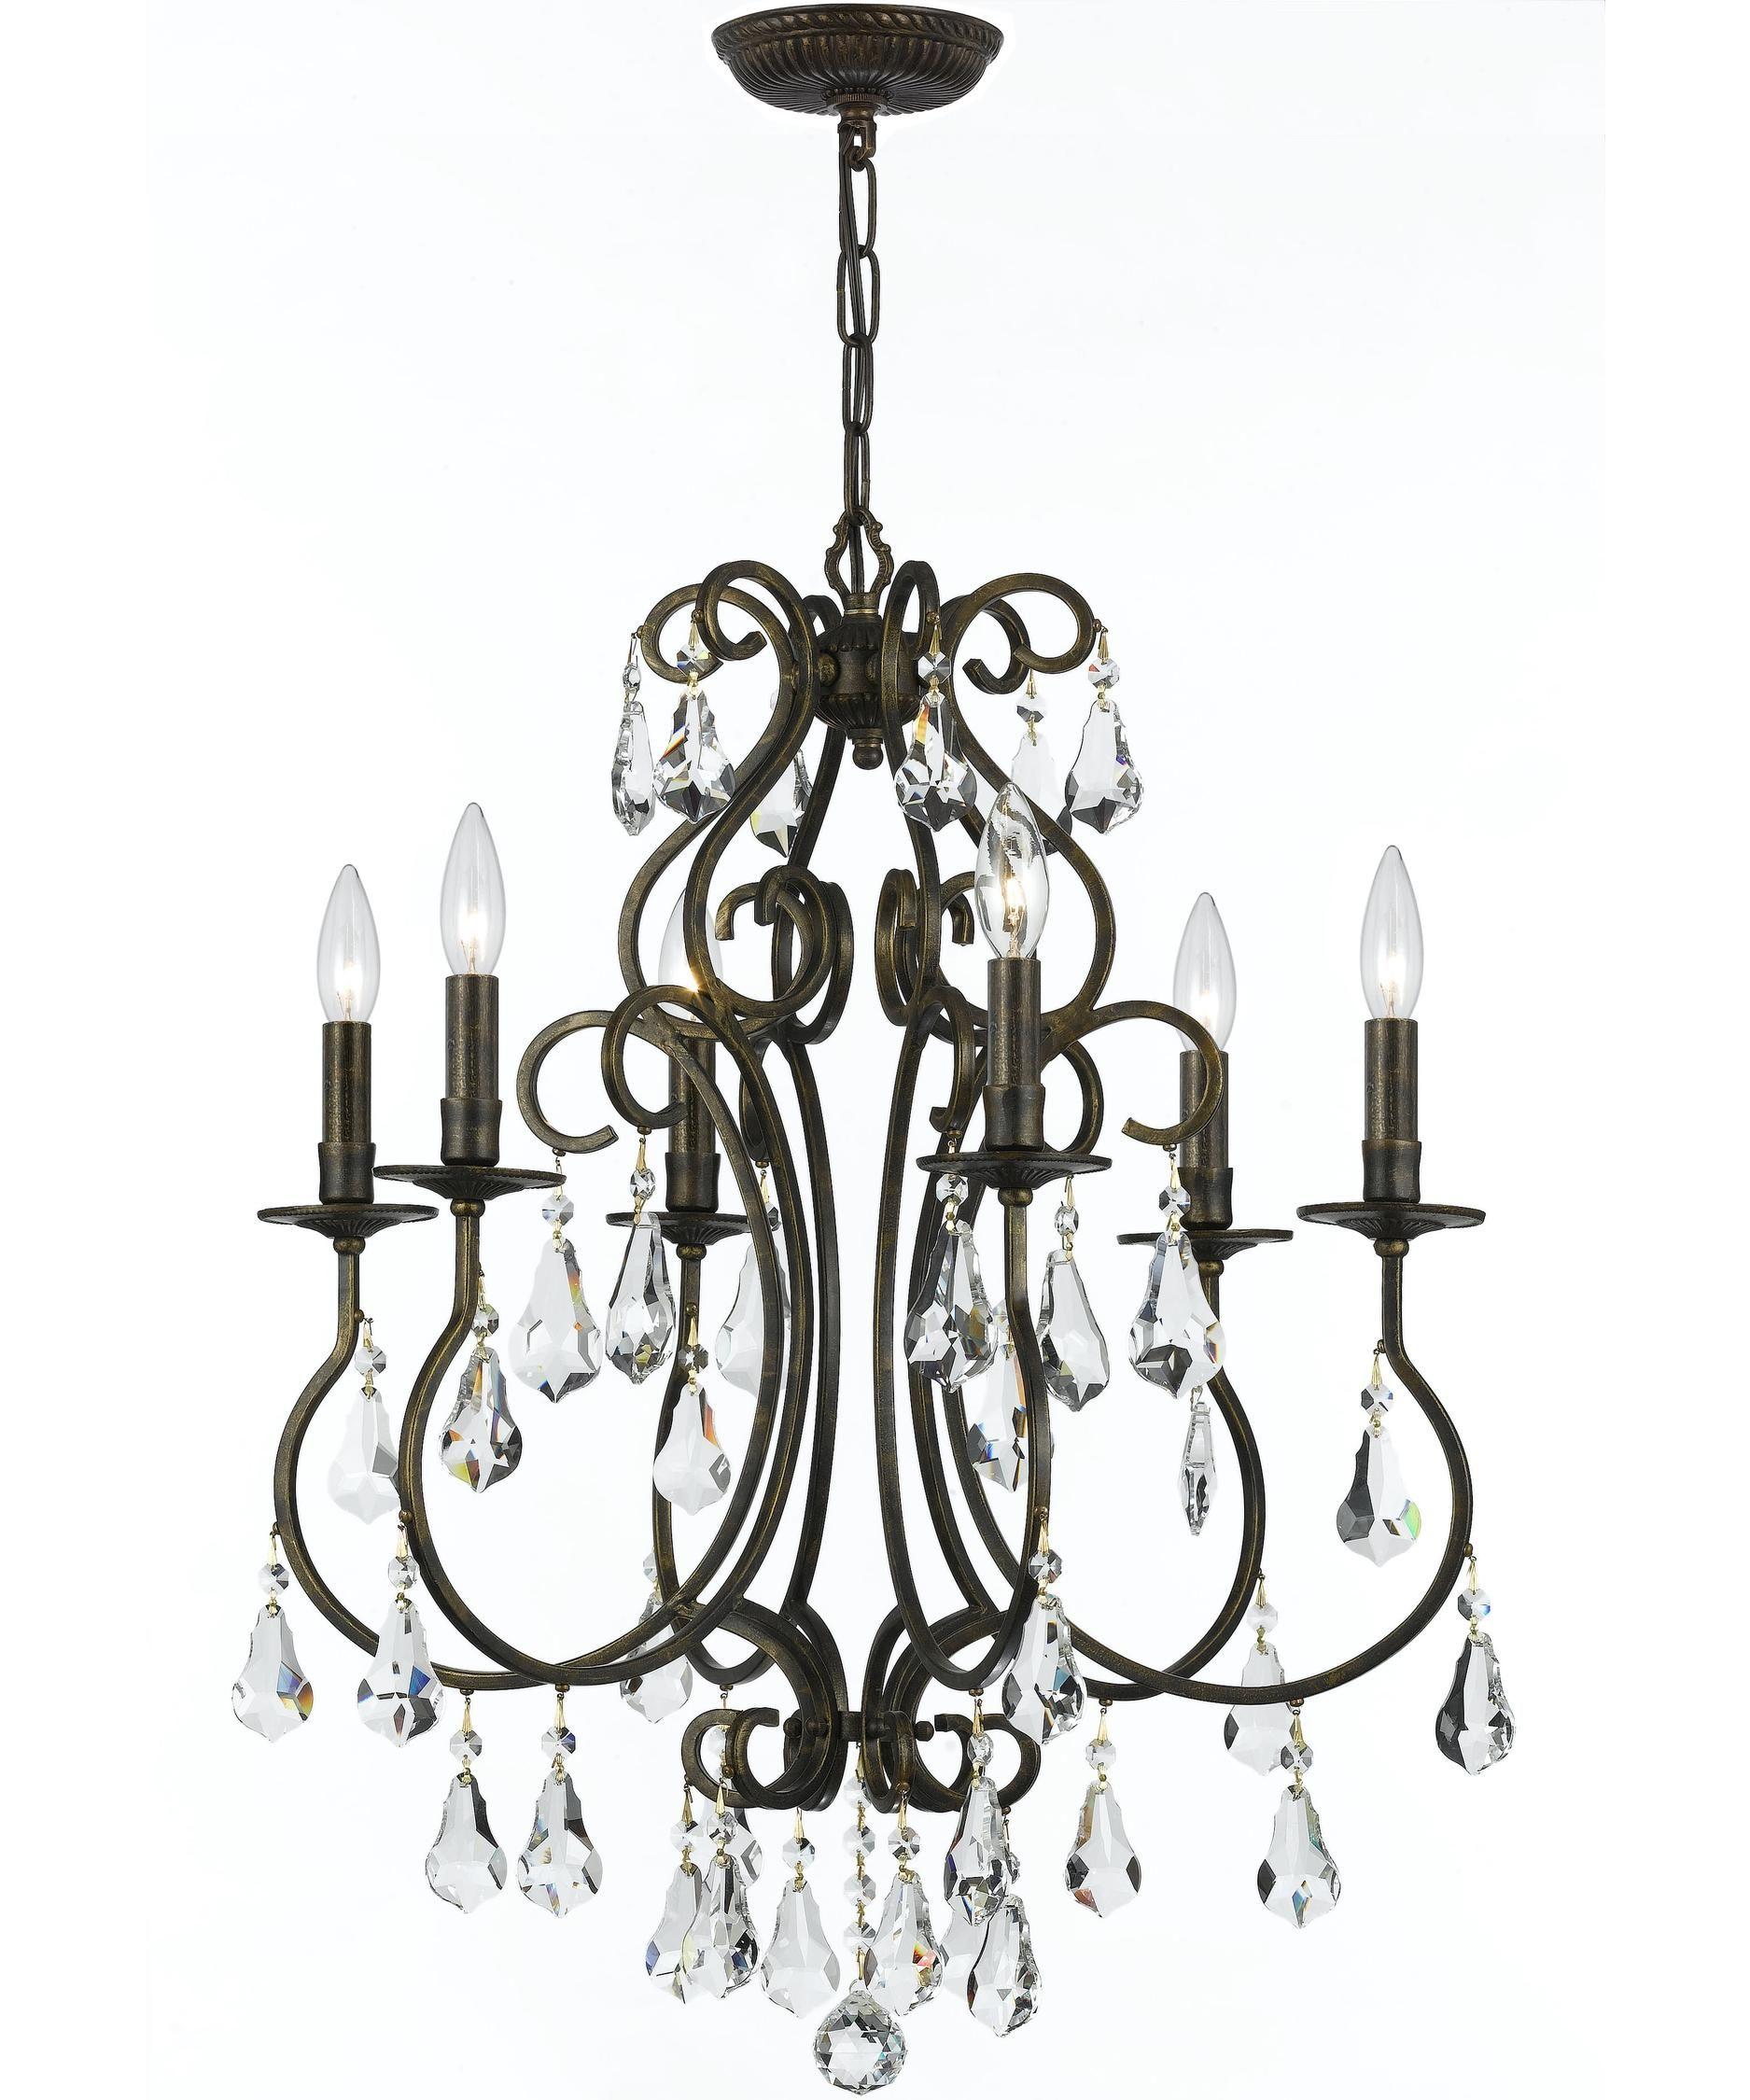 Crystorama ashton inch wide light mini chandelier in